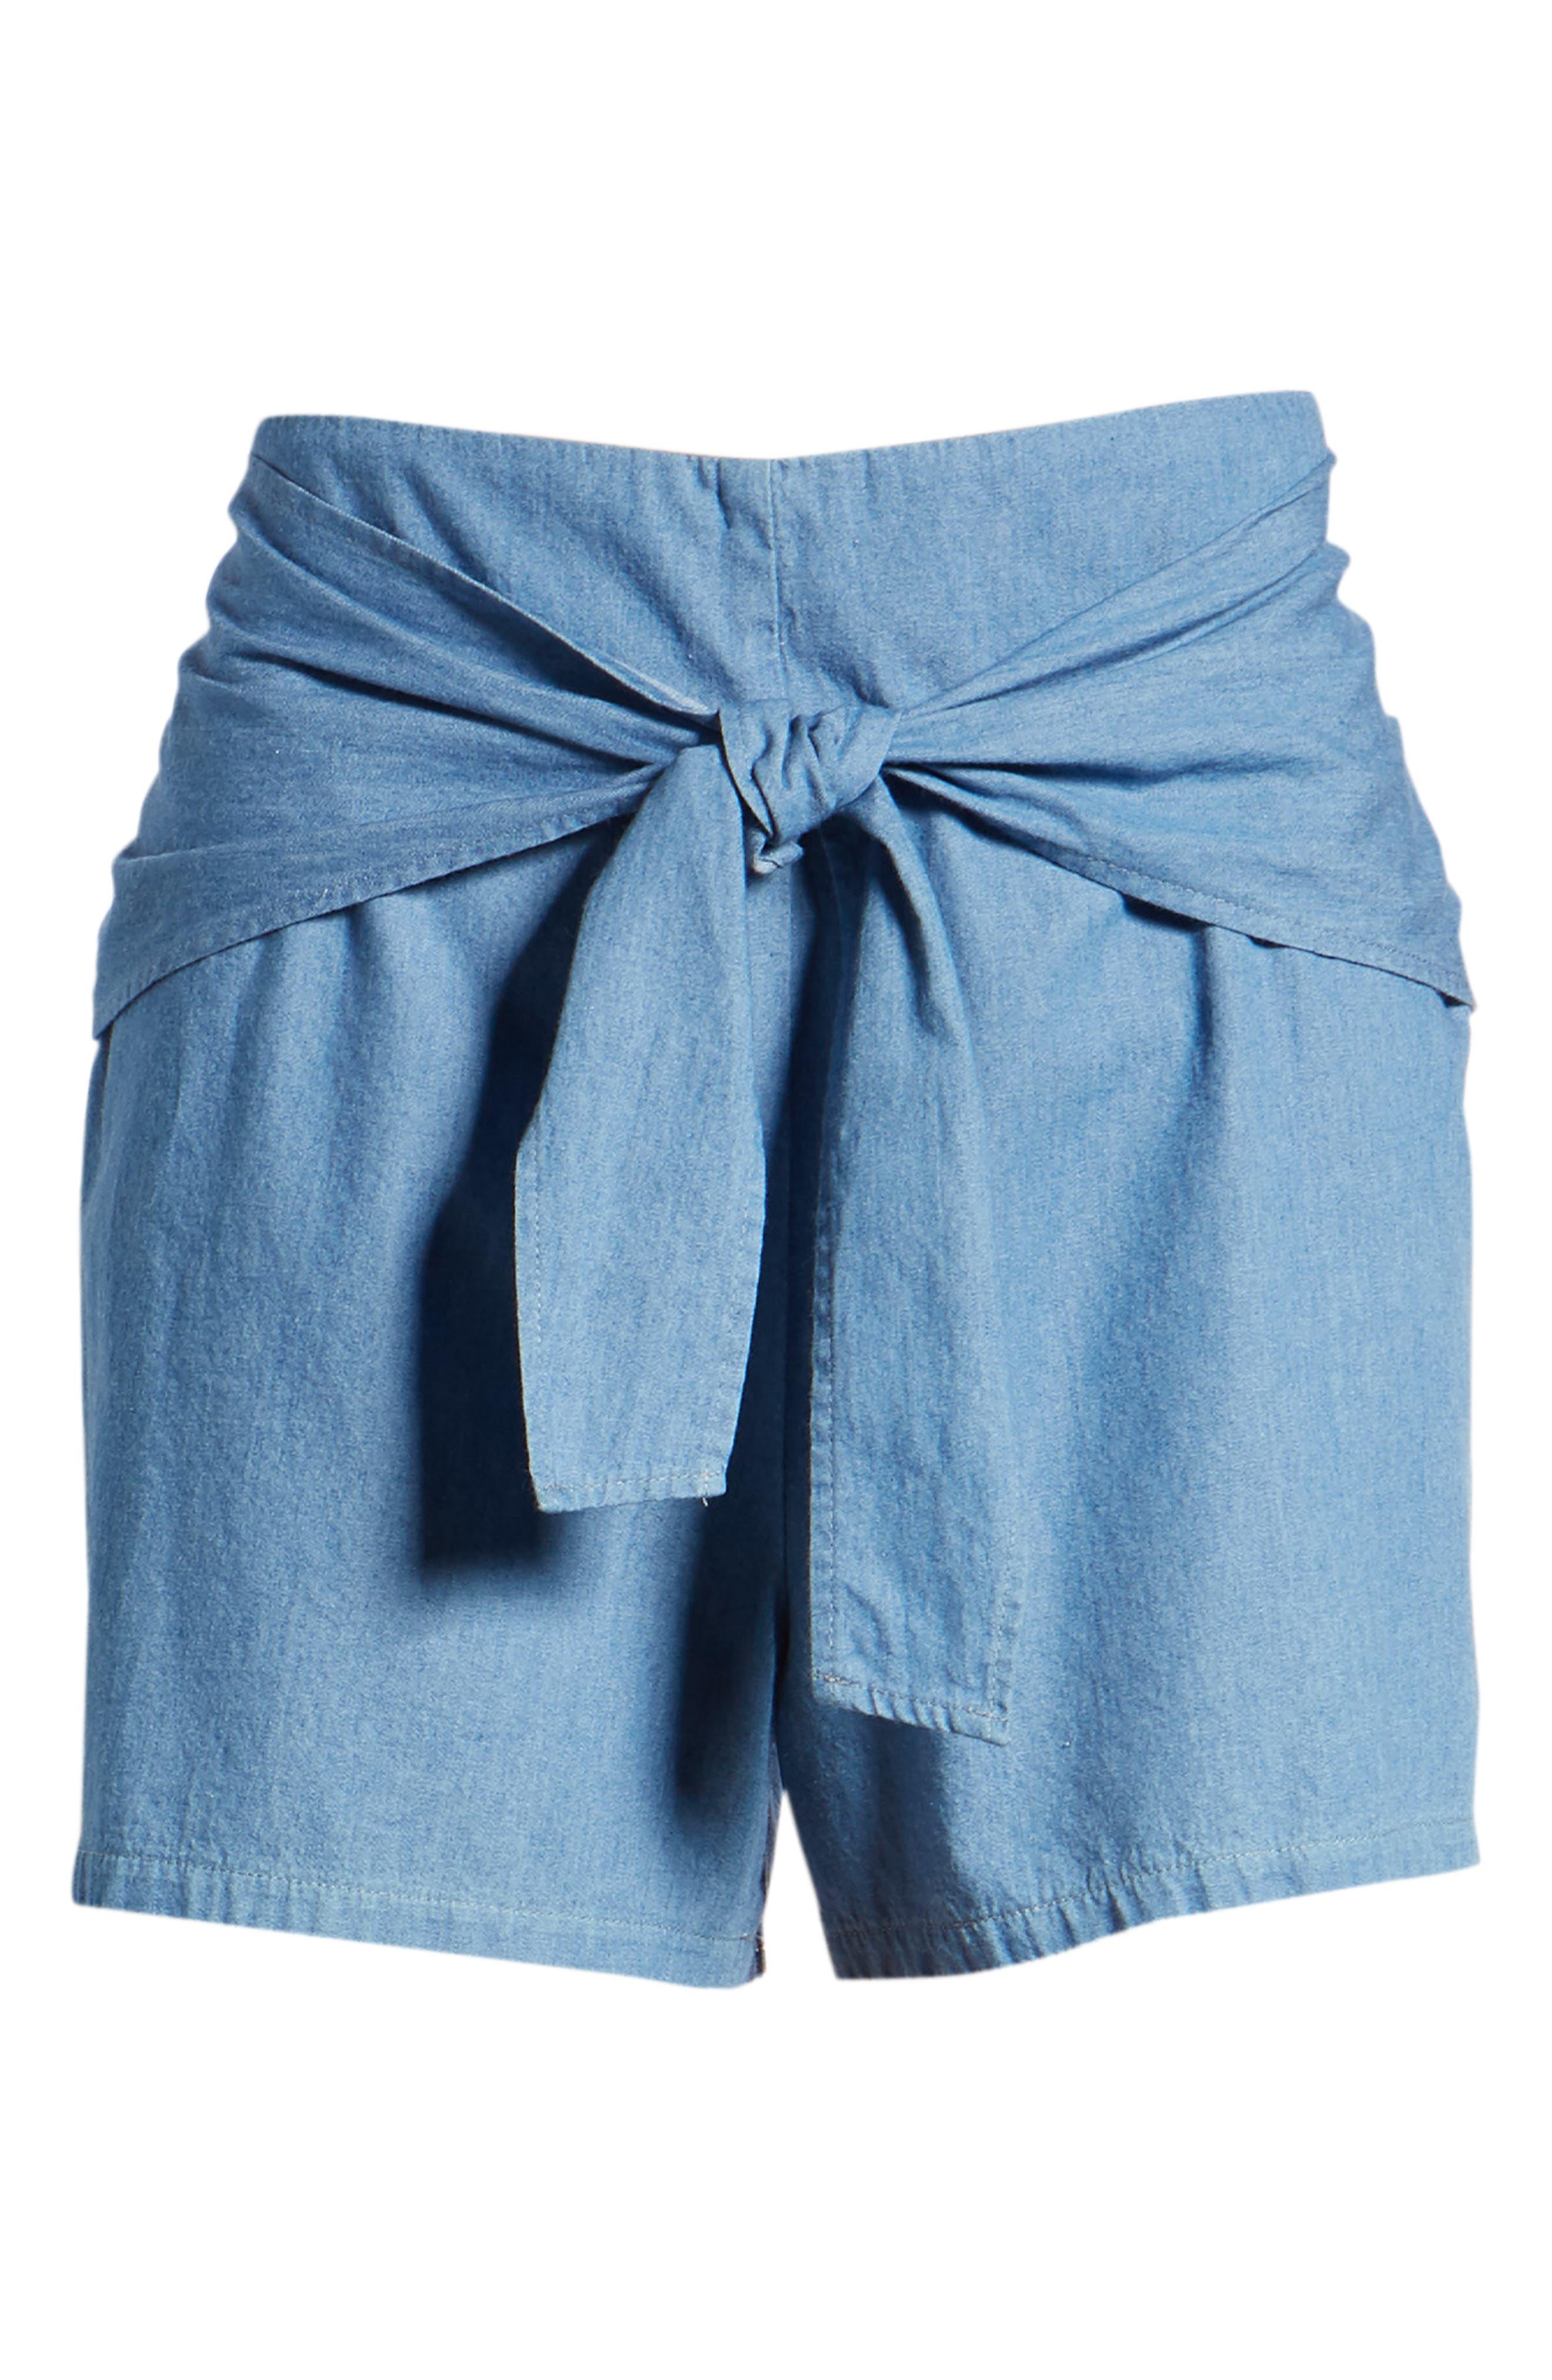 Tie Front Shorts,                             Alternate thumbnail 6, color,                             400